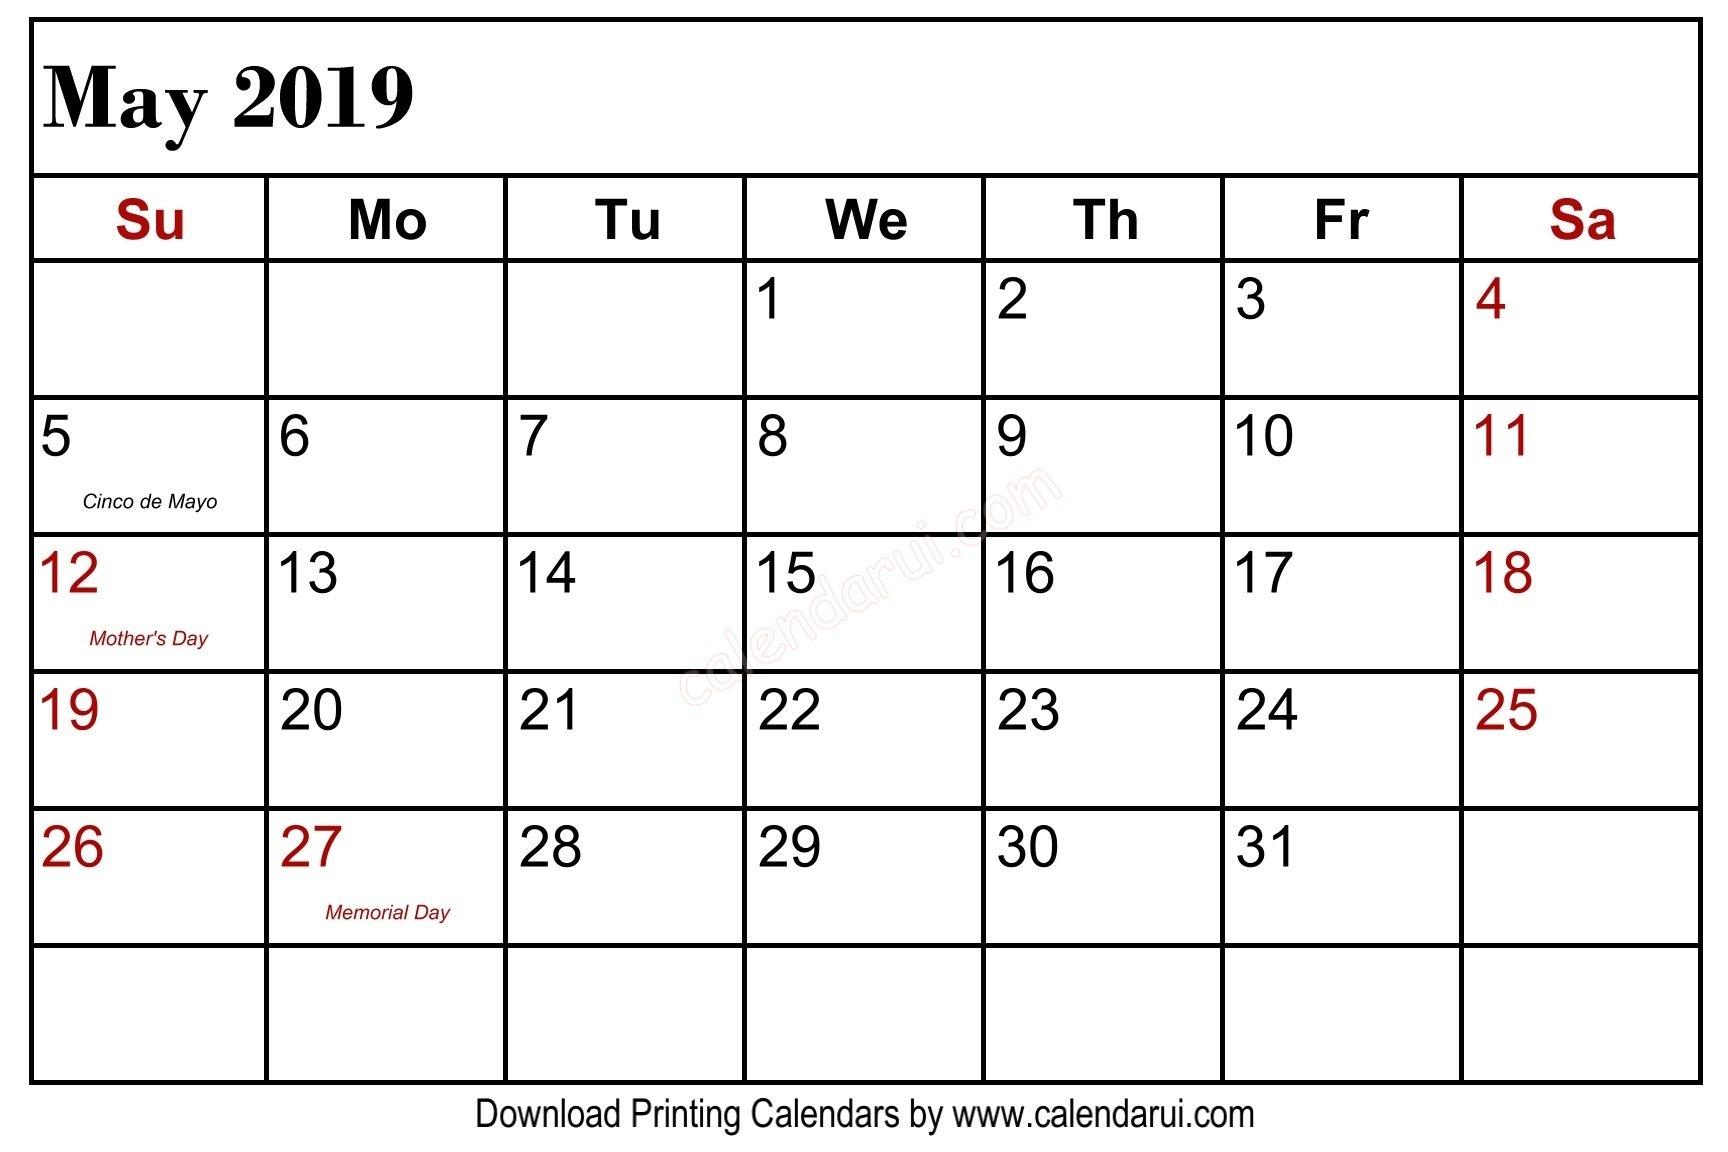 May 2019 Calendar Holidays Printable Usa Public Holidays 2